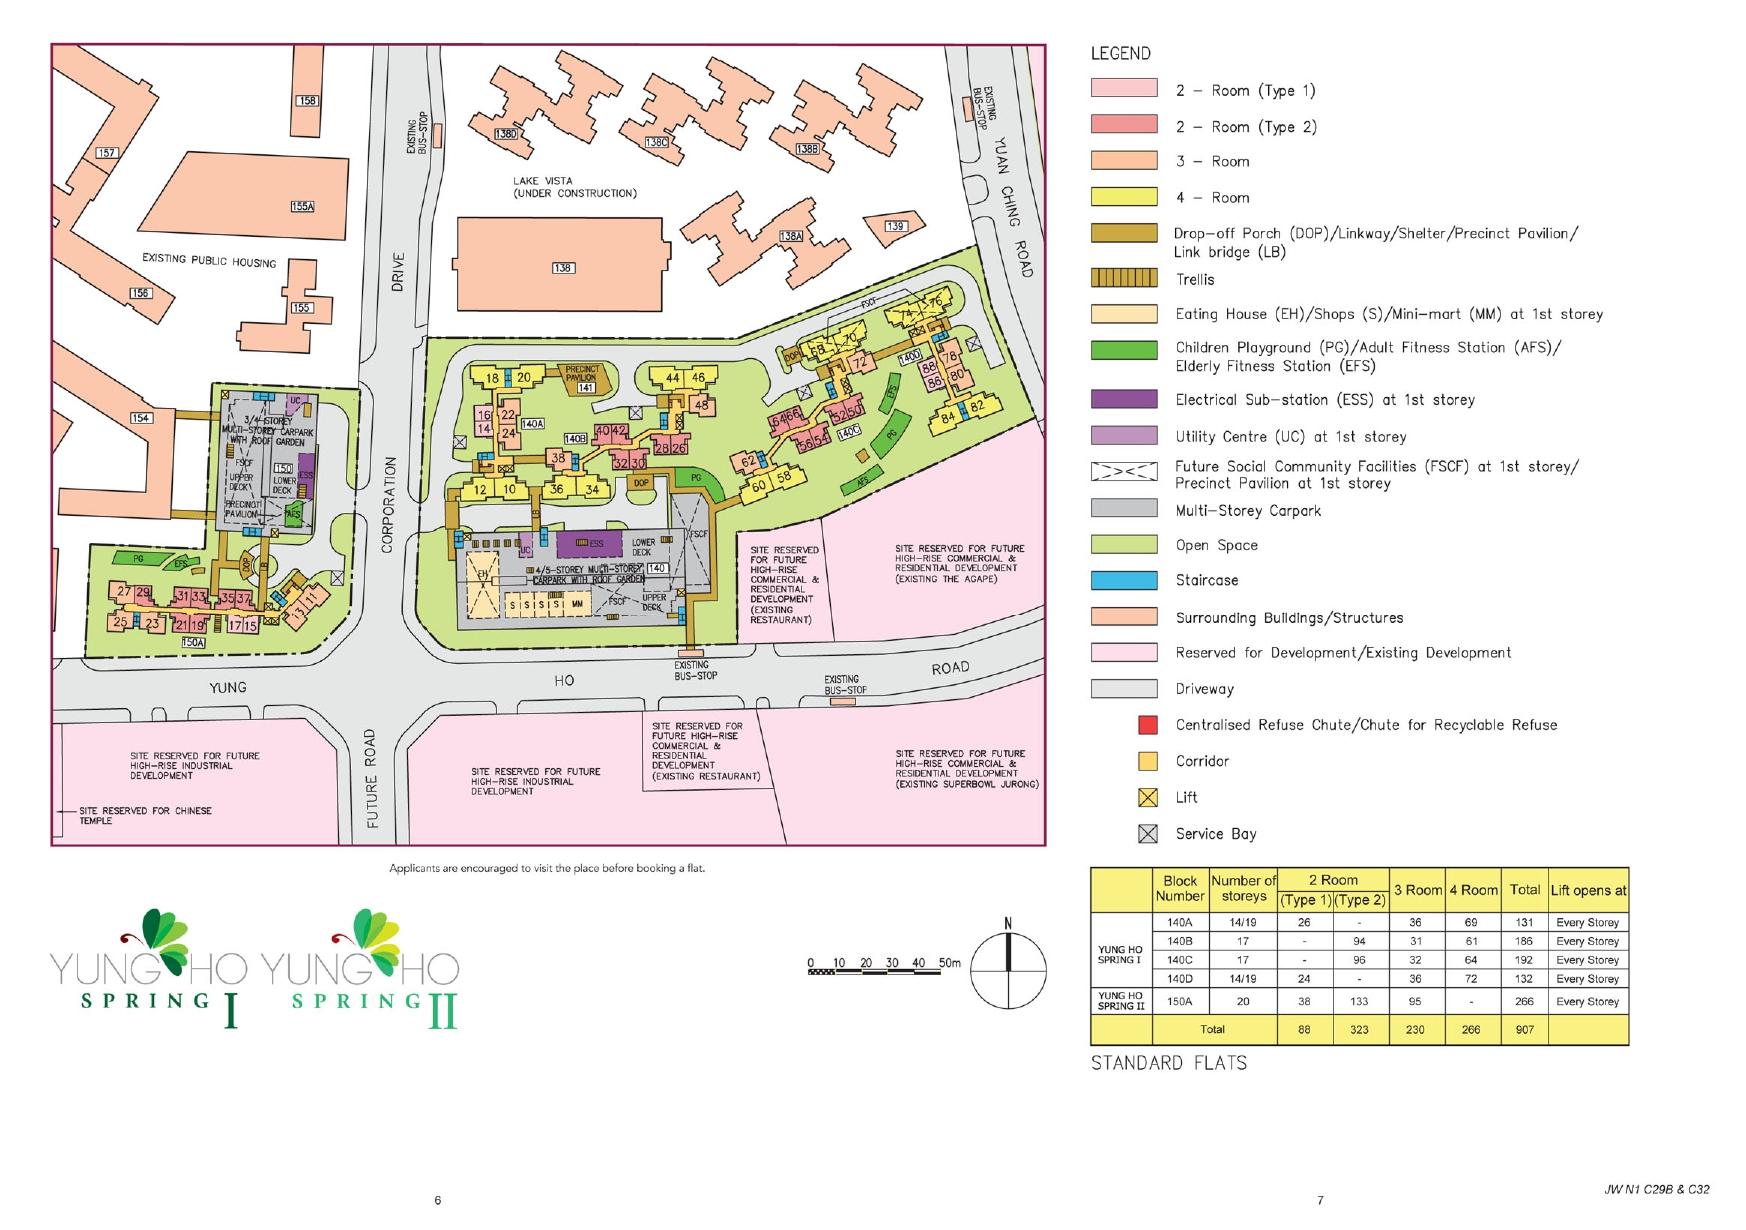 Yung Ho Spring II Site Plan